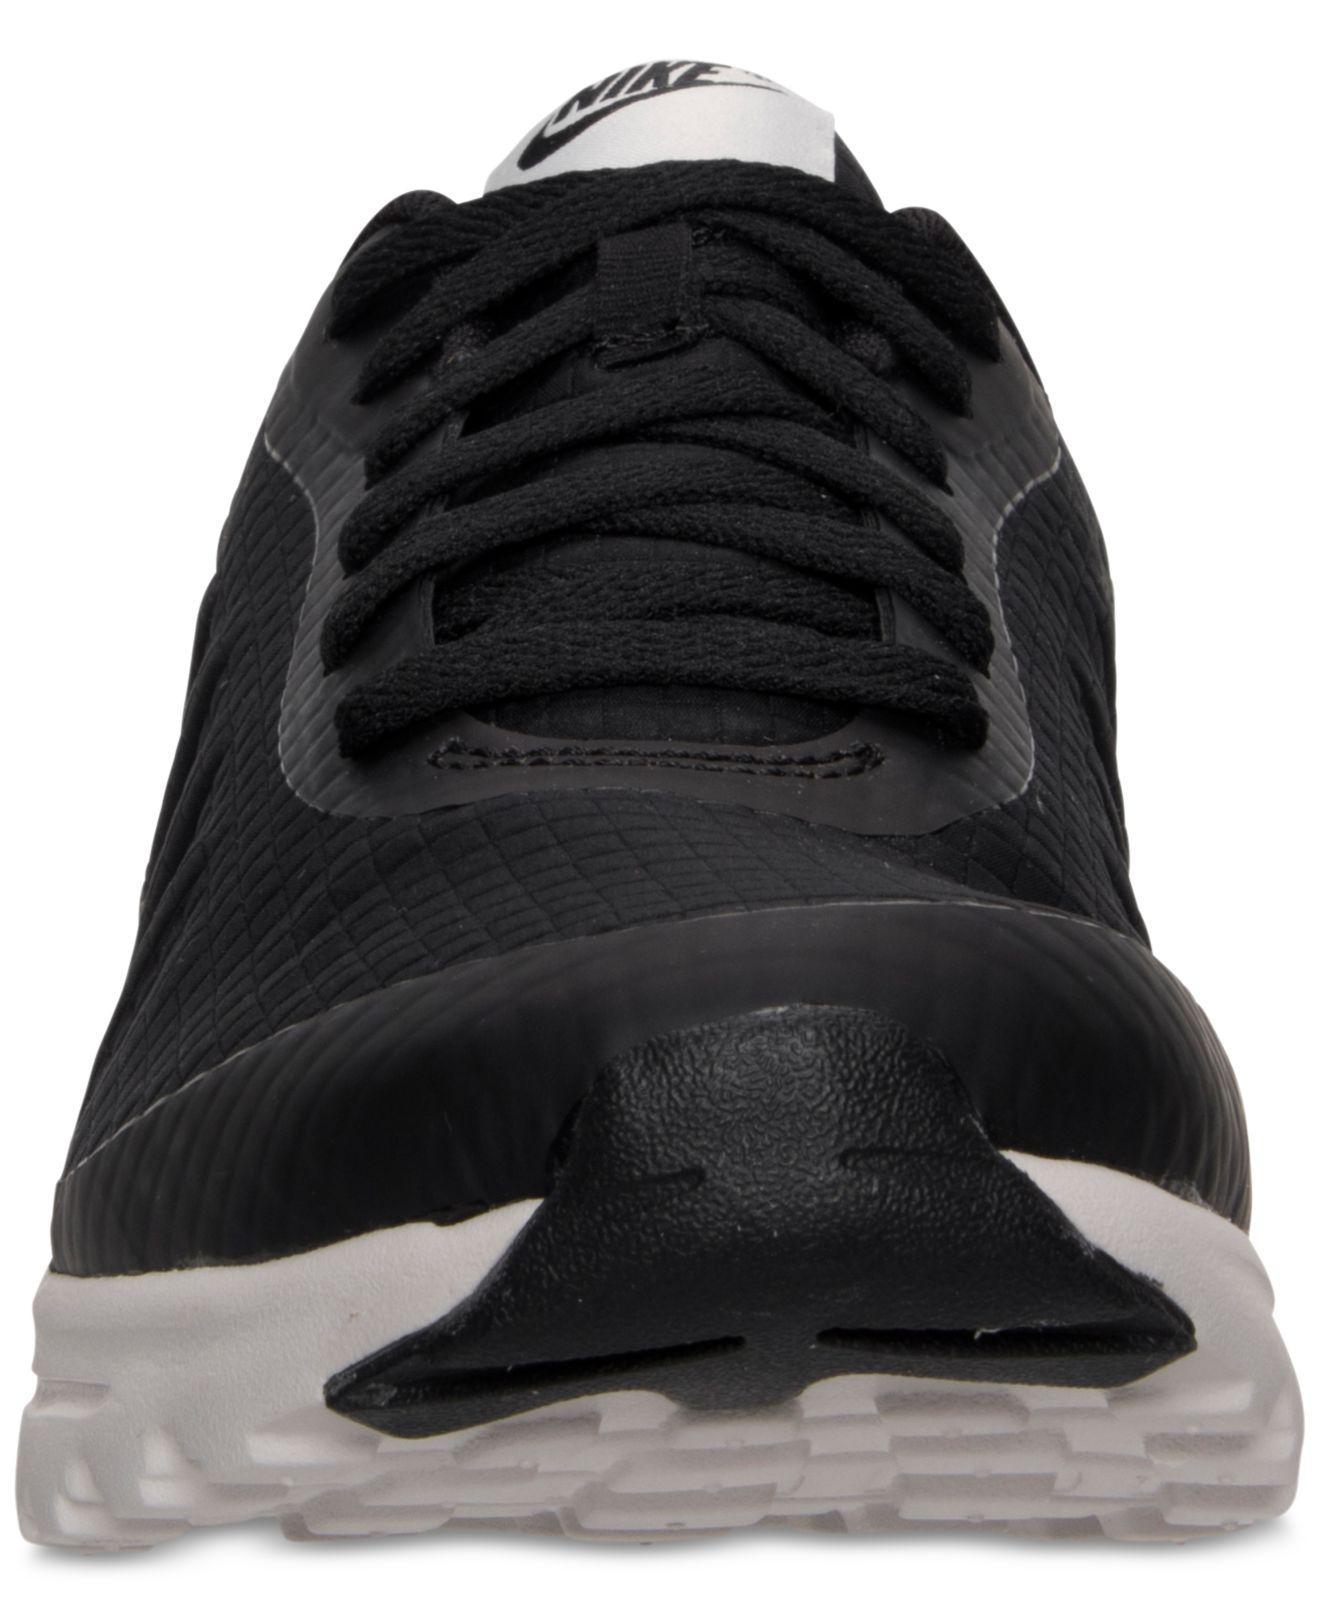 42adca4ec6 ... discount lyst nike mens air max invigor se running sneakers from finish  e7bdc 64572